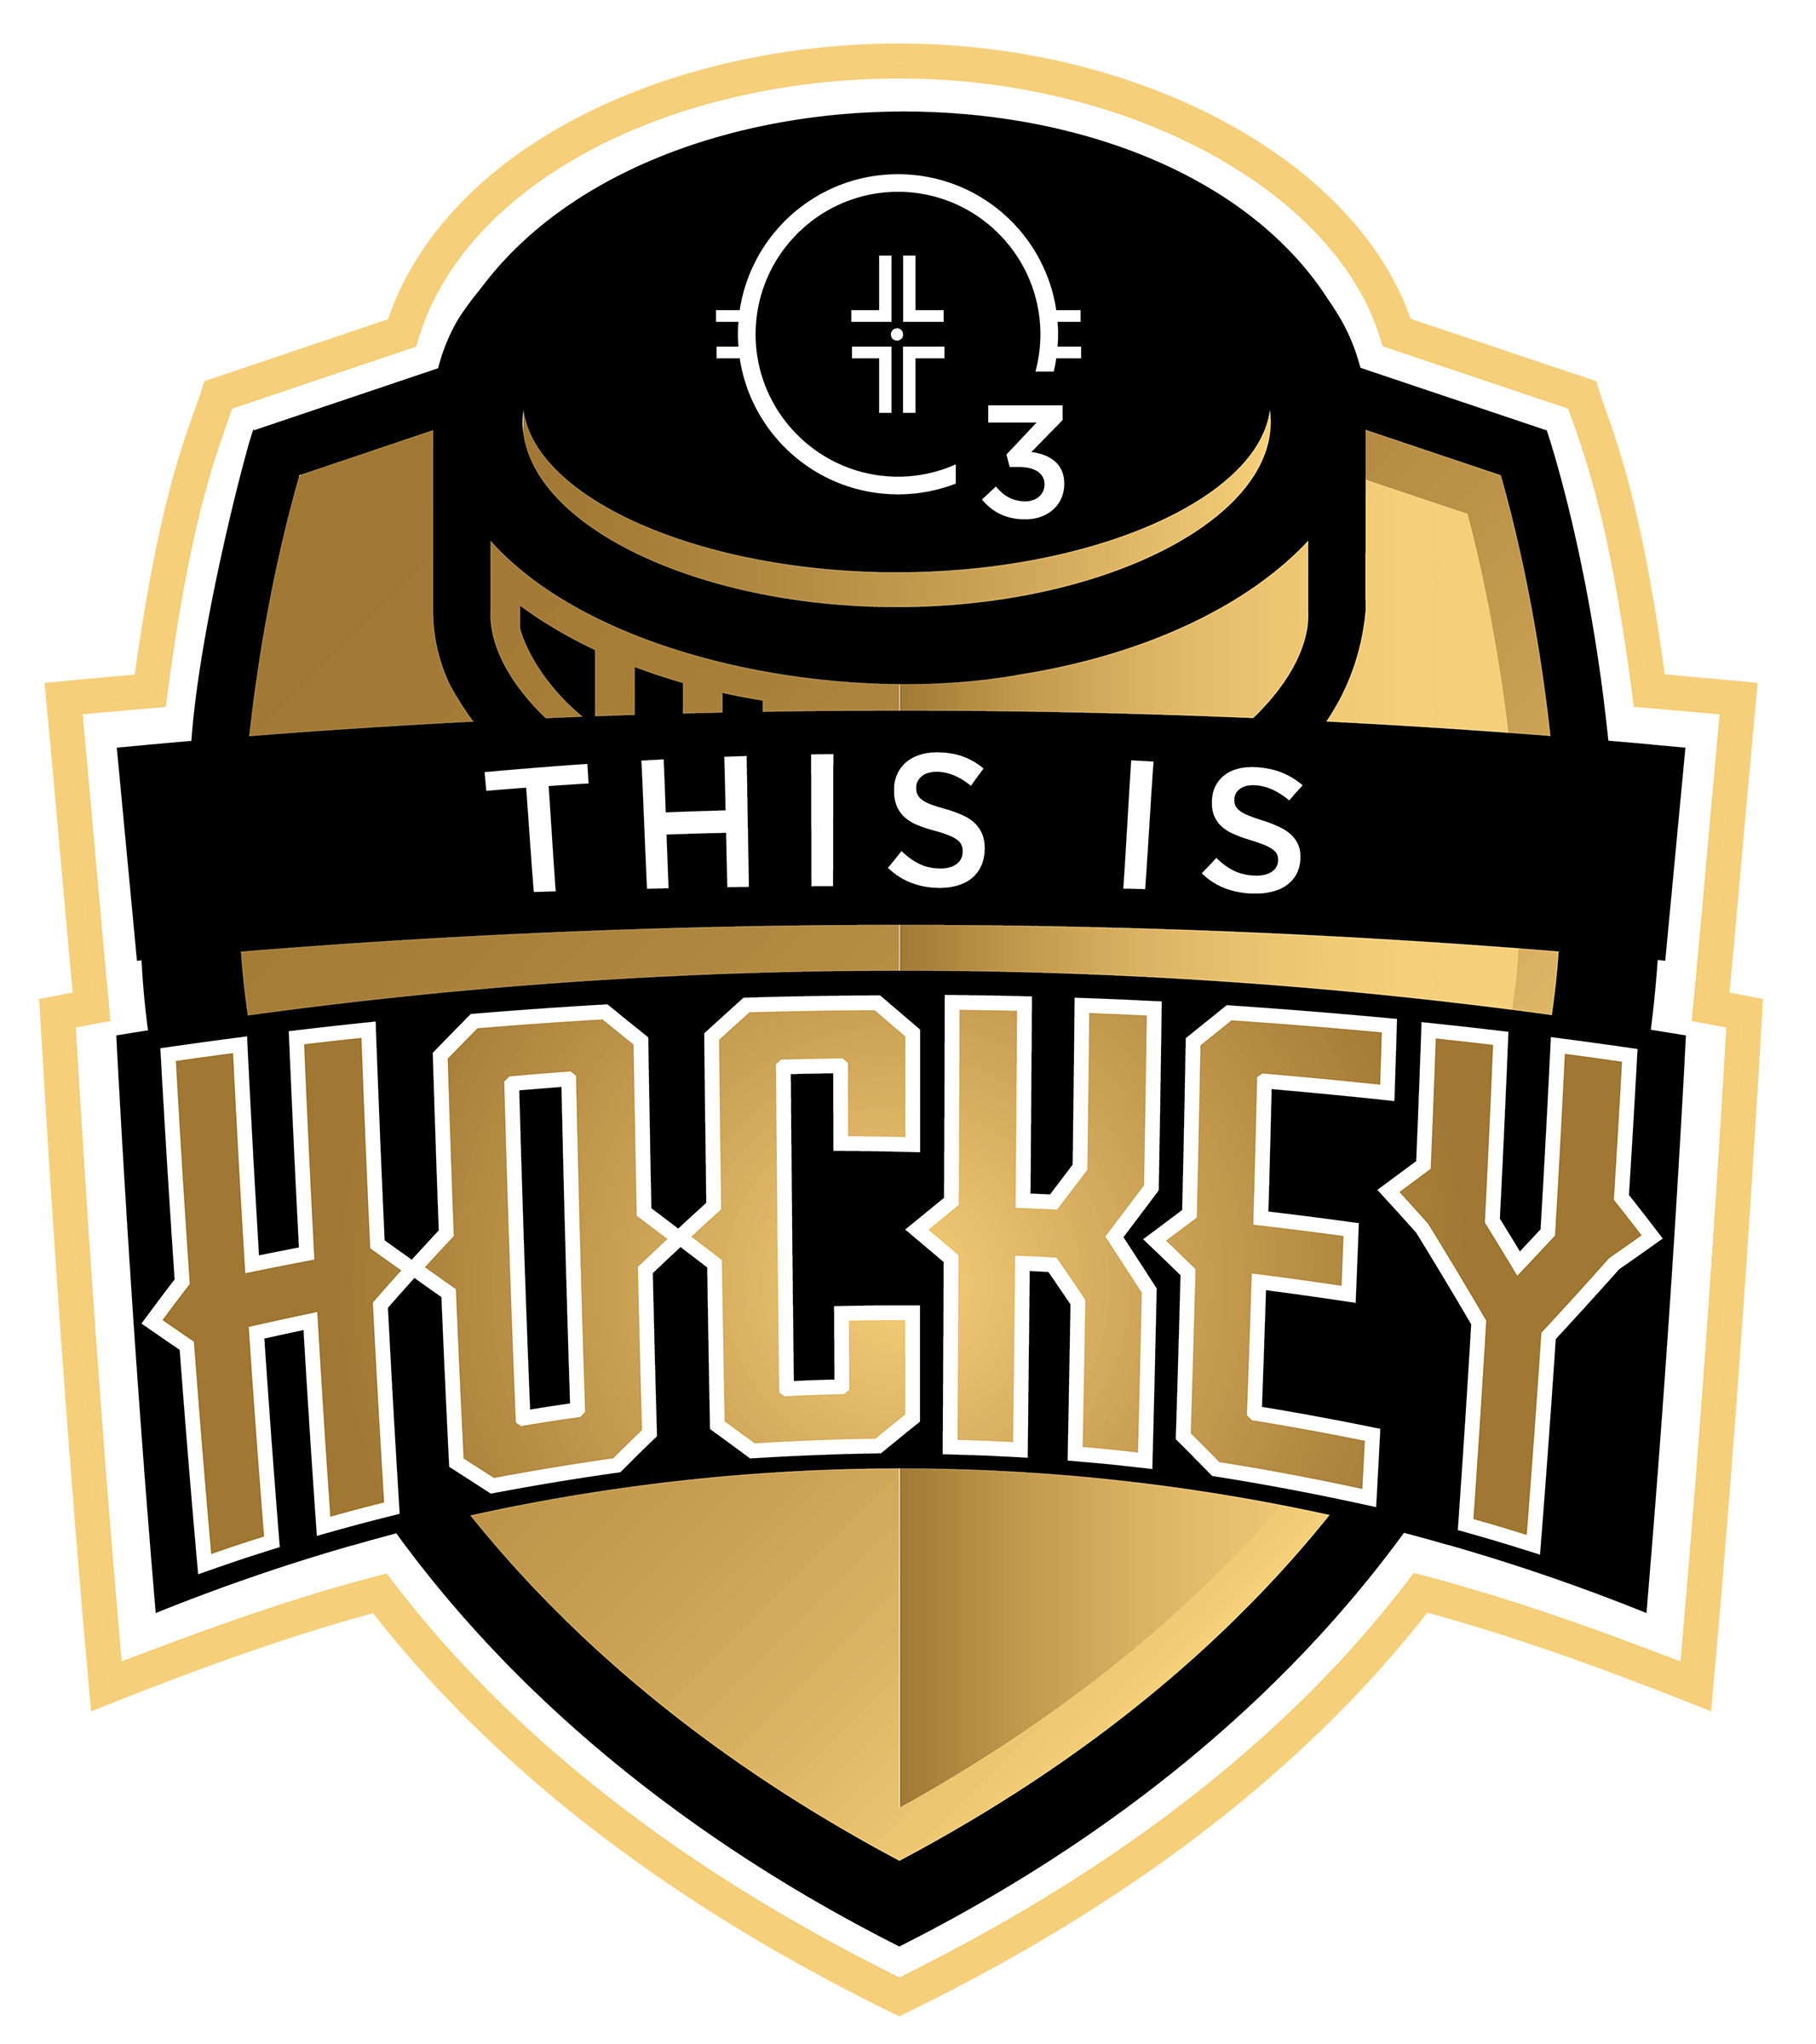 Ozone This is Hockey